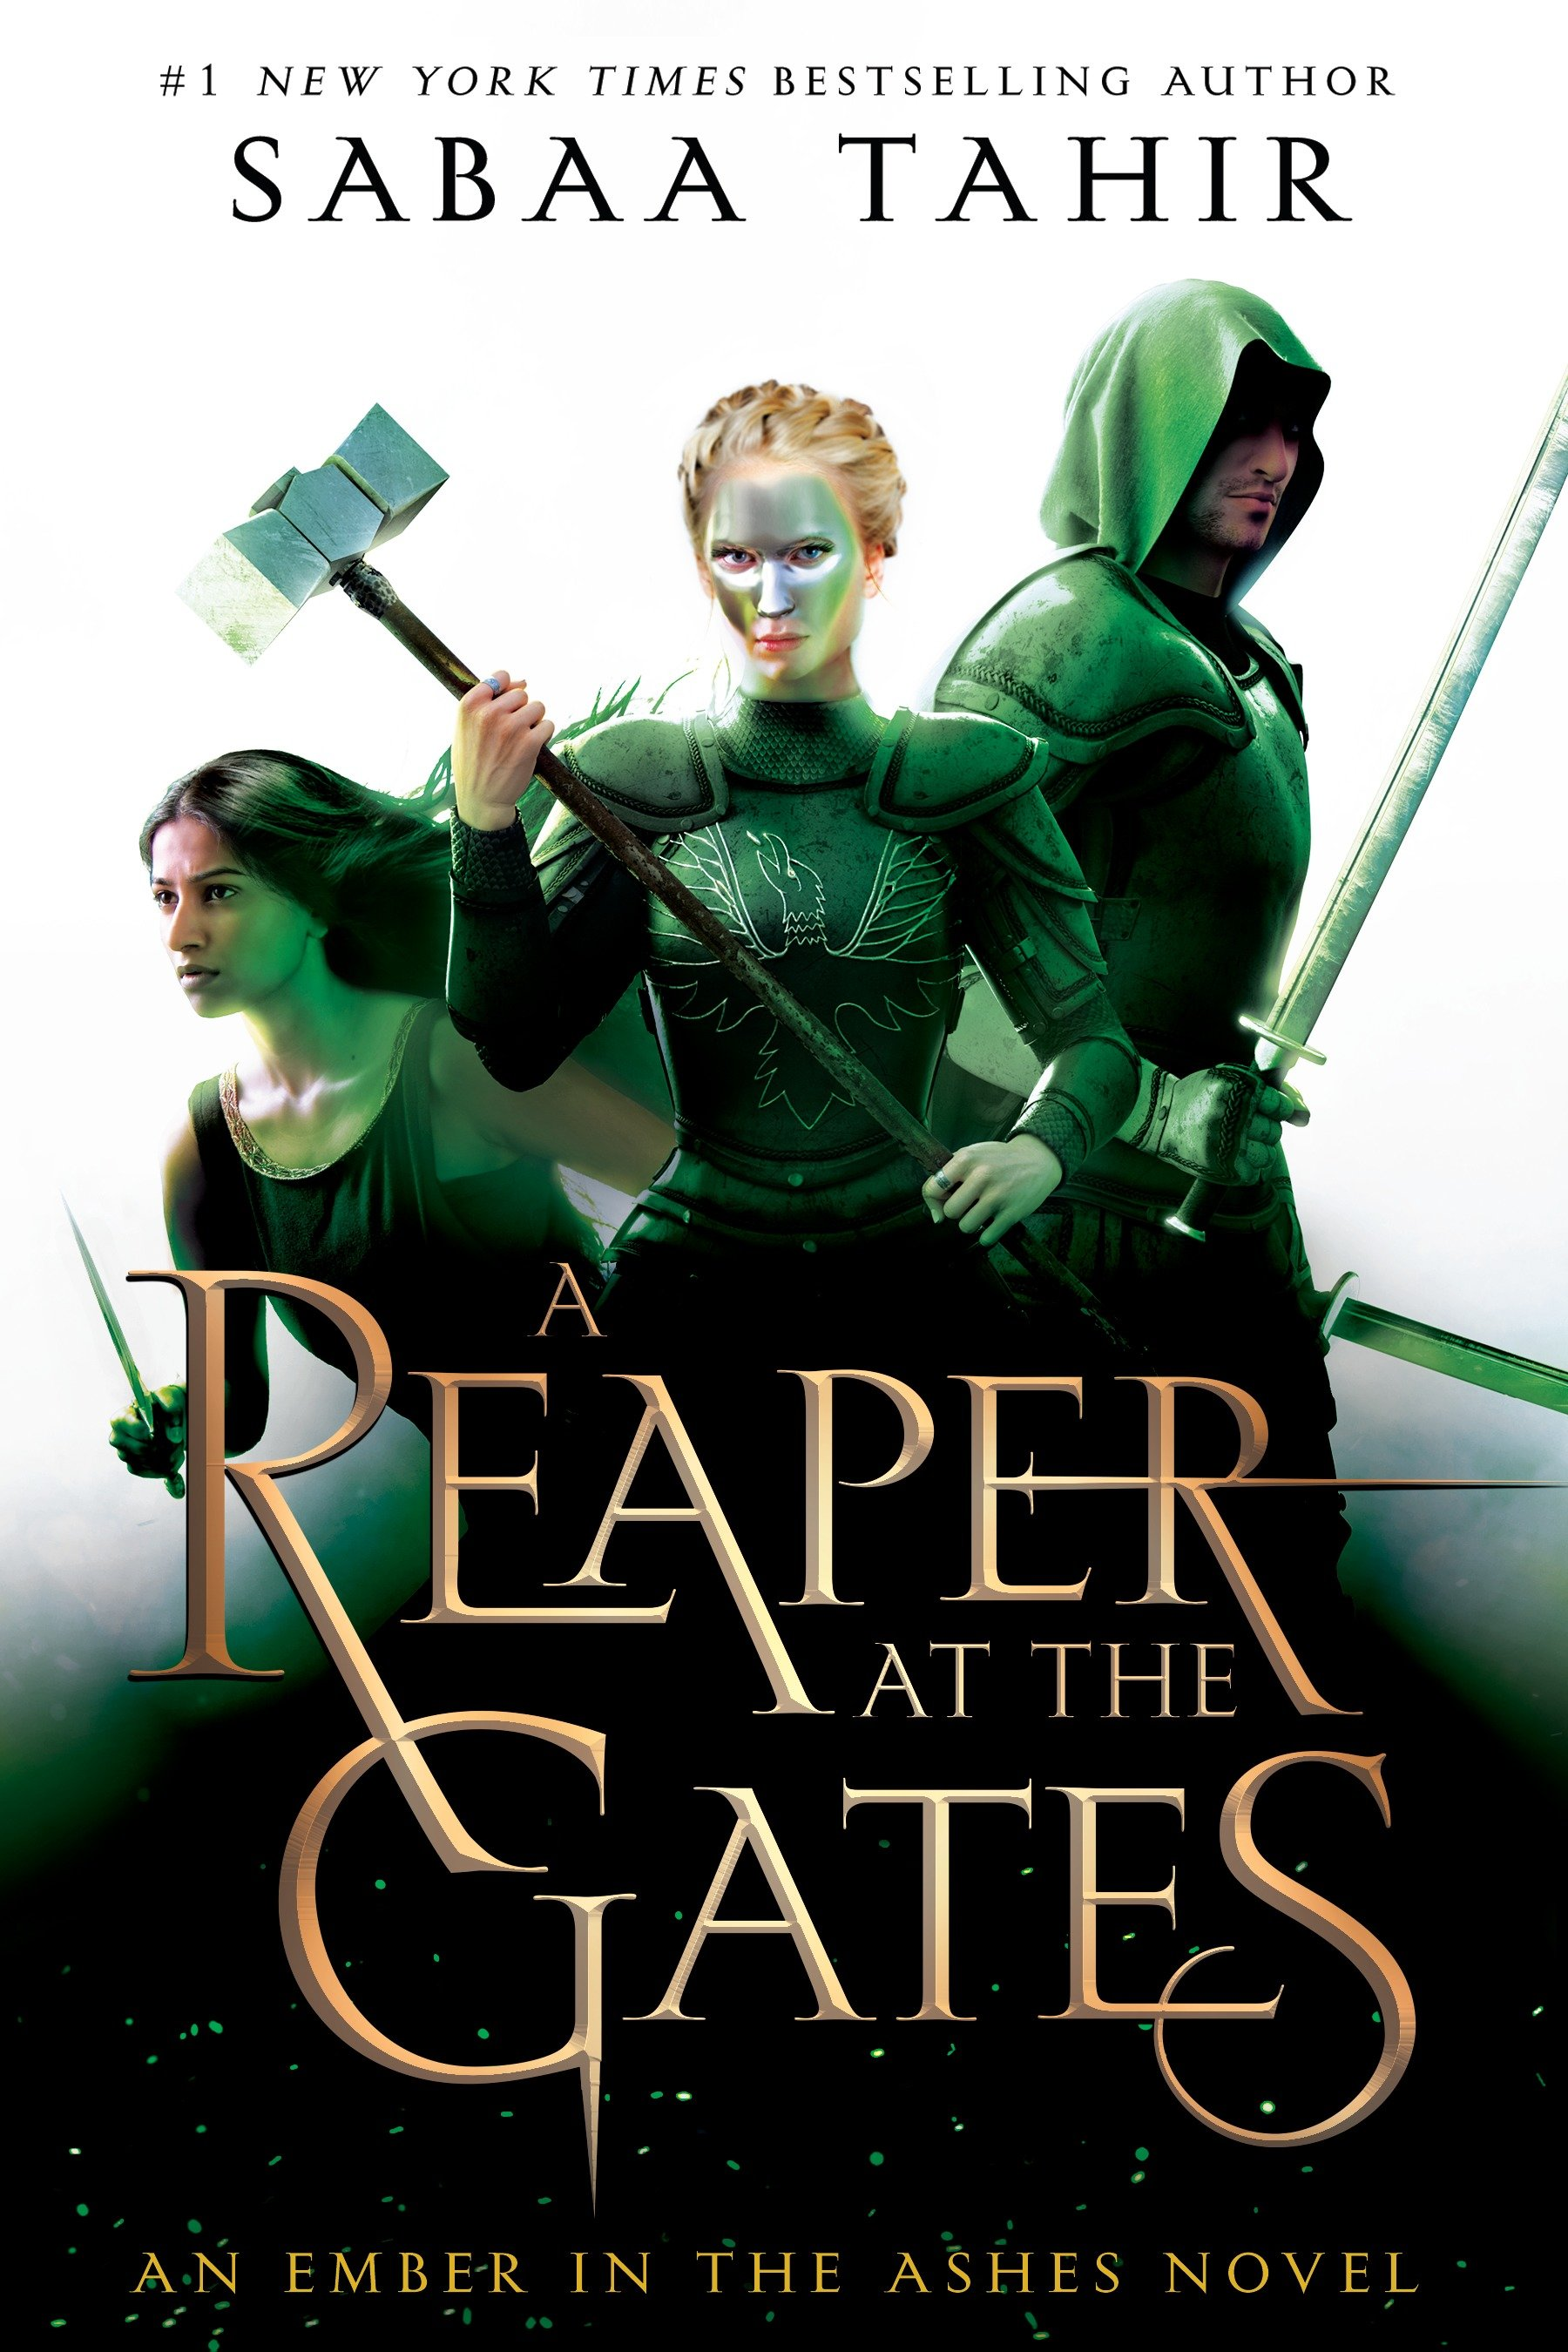 A reaper at the gates a novel